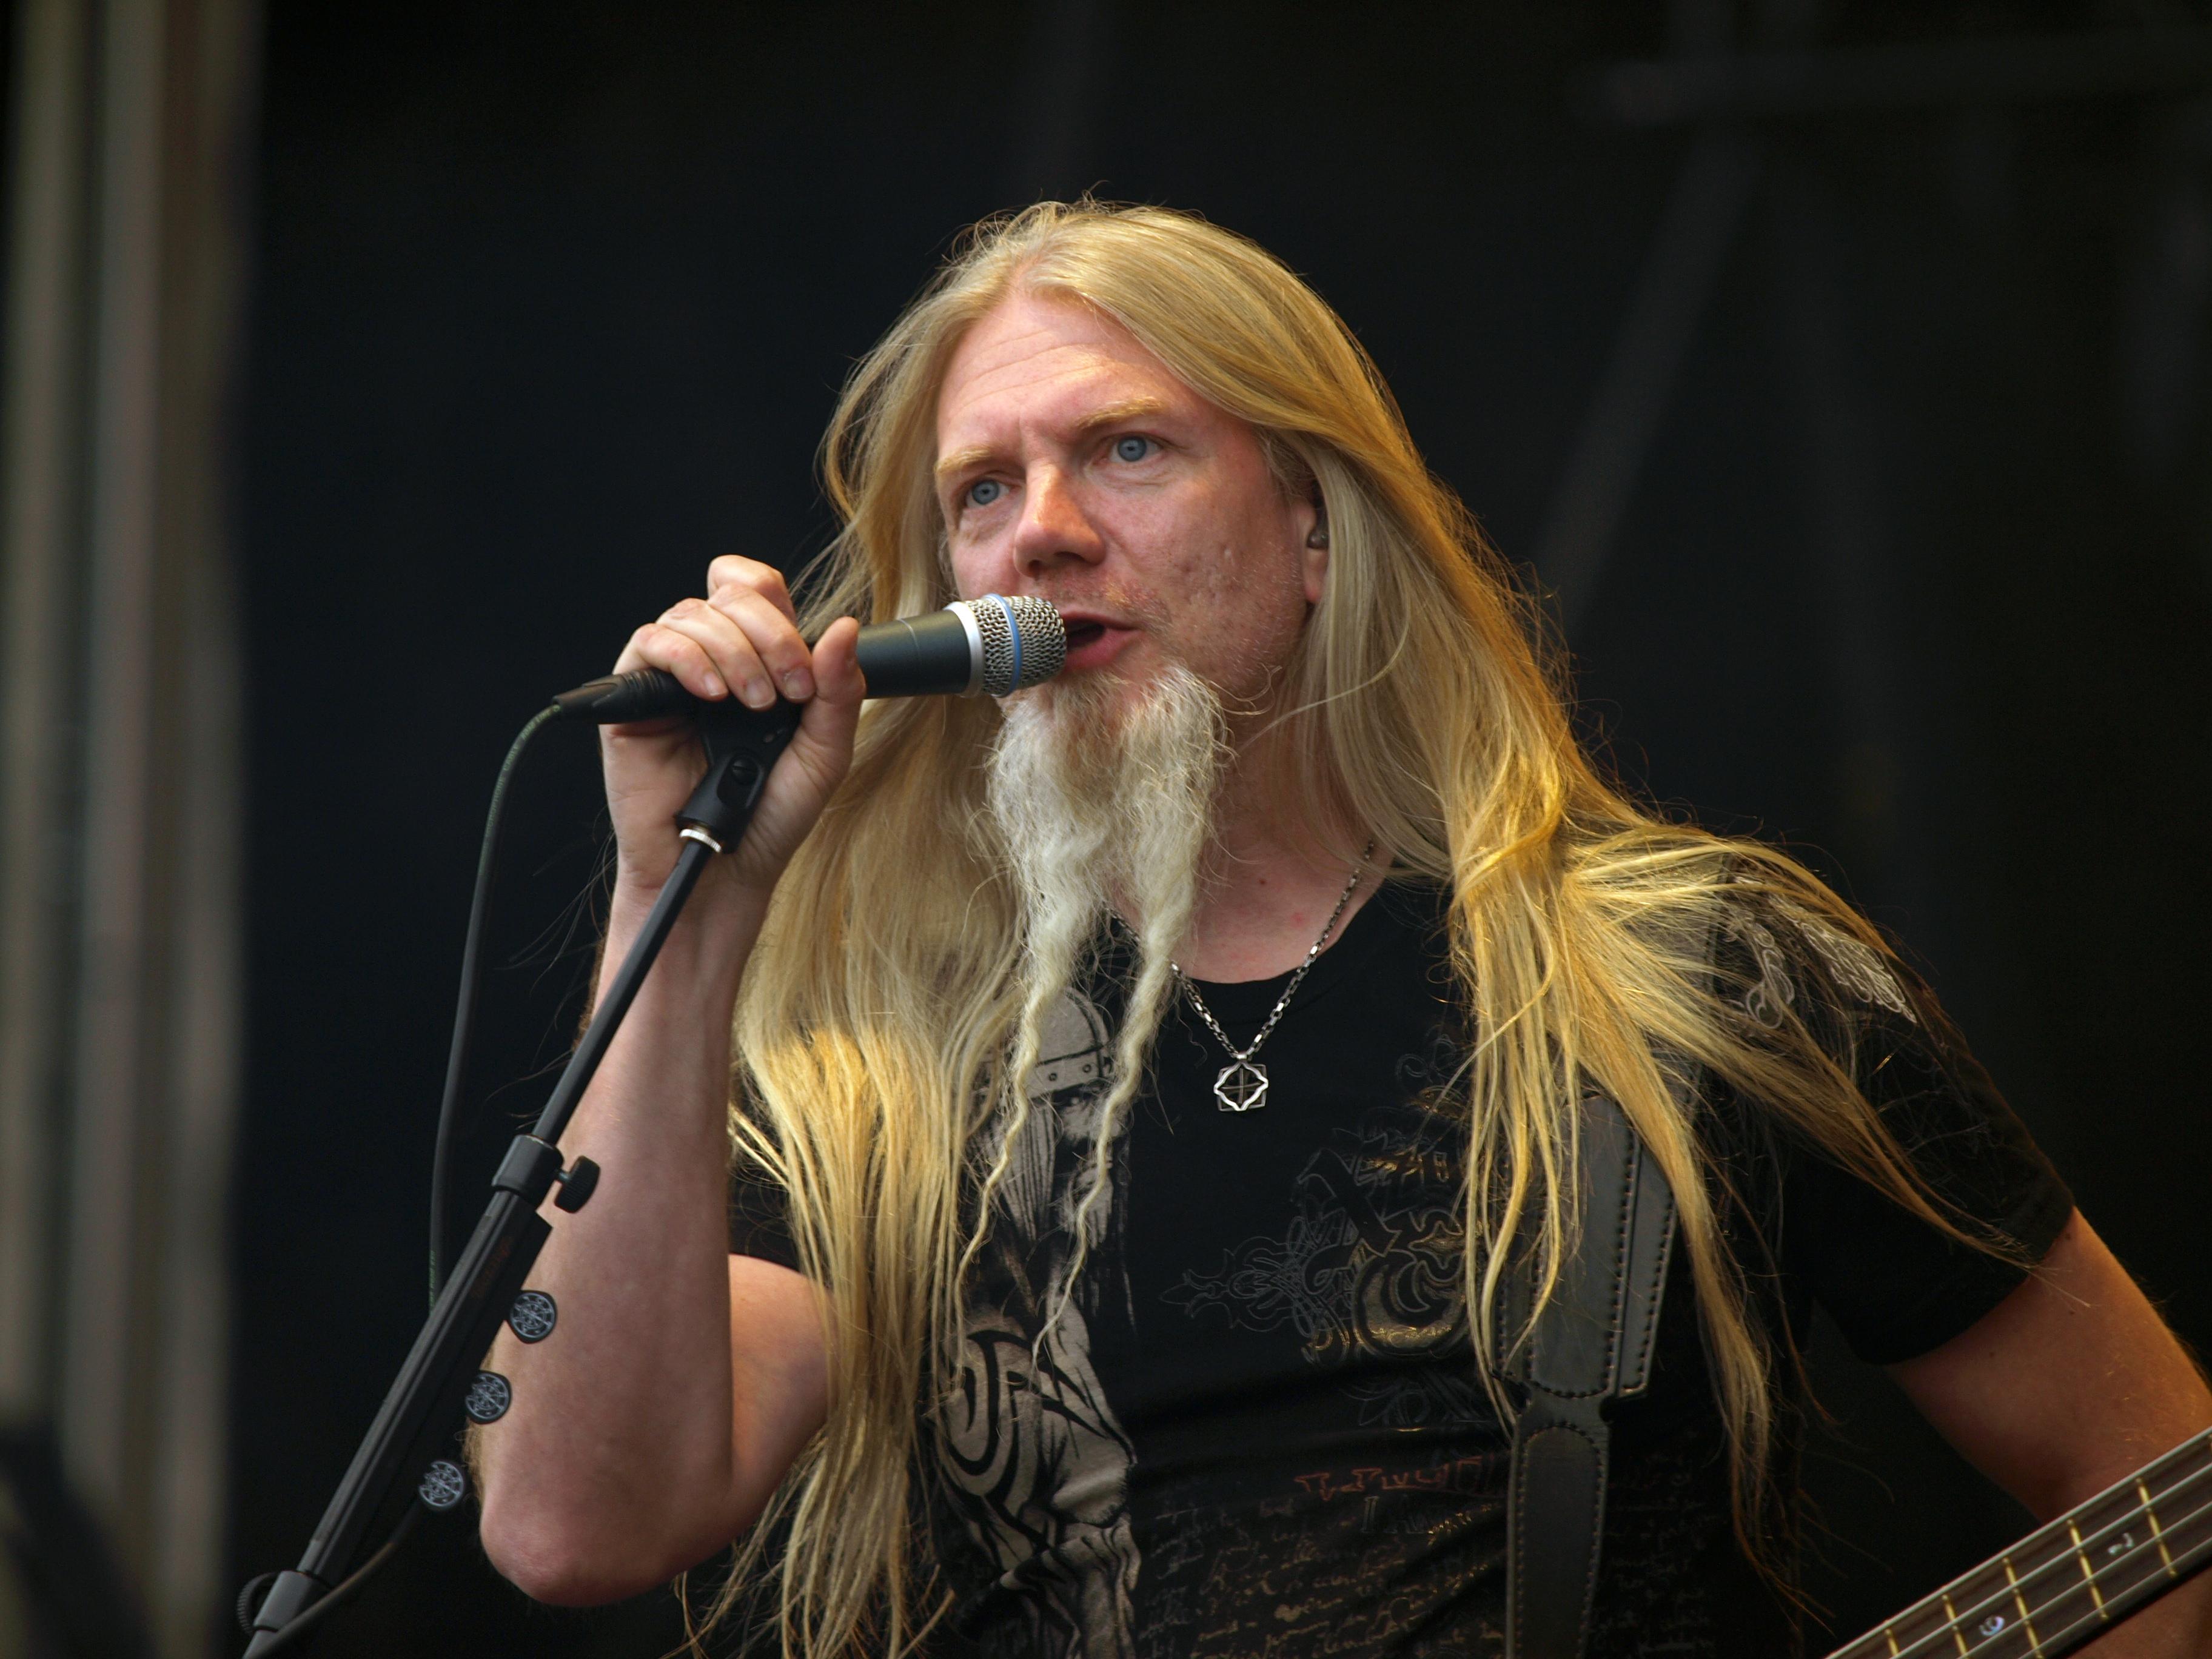 Do You Like Very Long Hair On Men Girlsaskguys